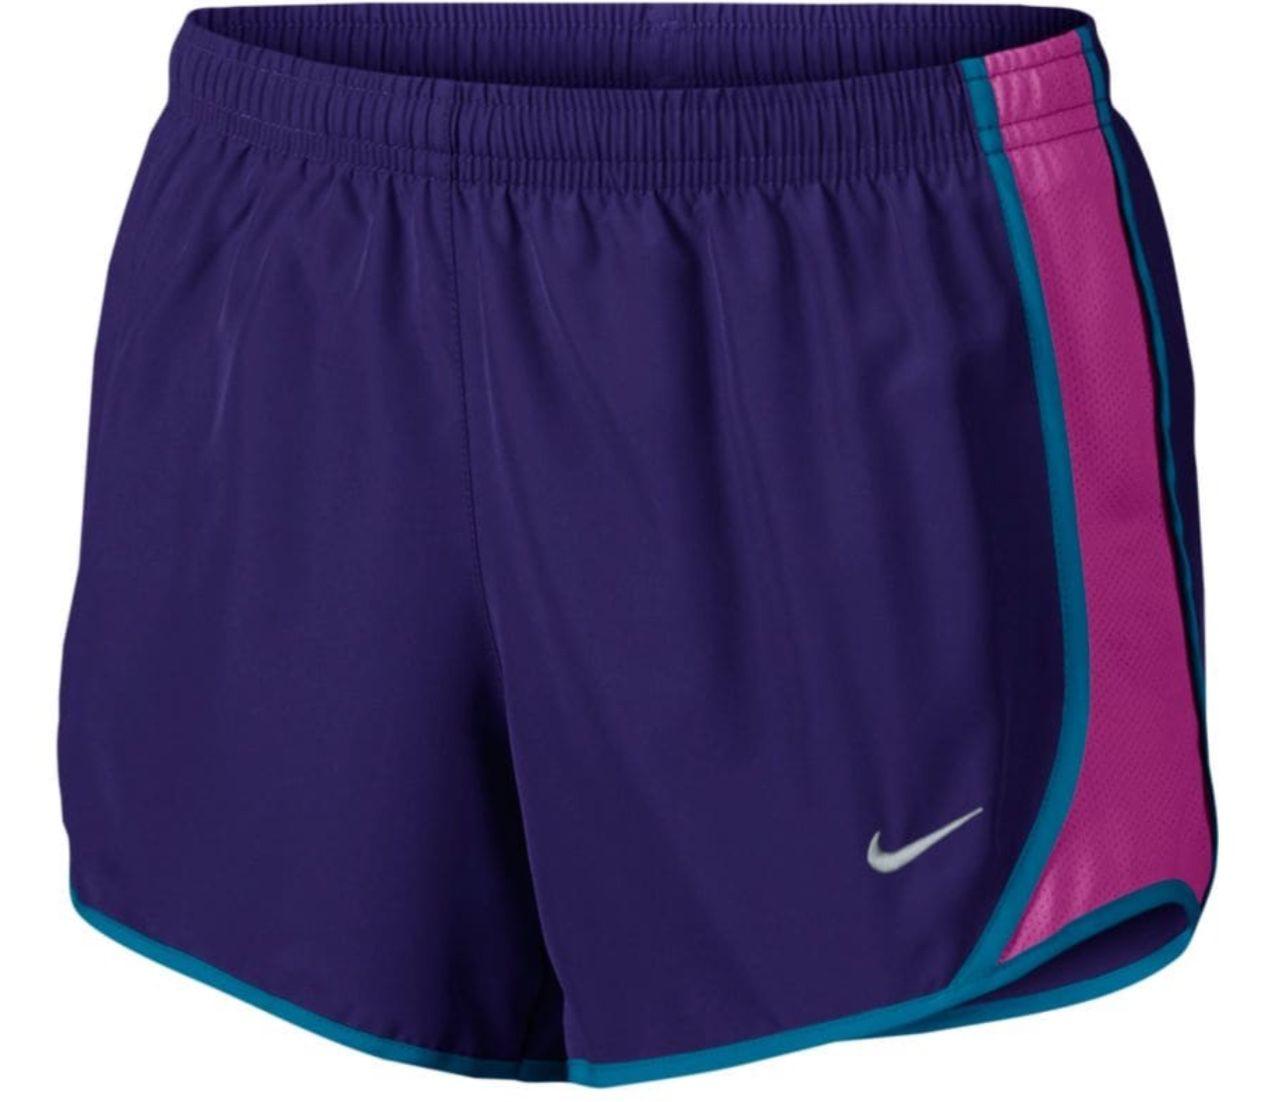 Nike Toddler Girls' purple/blue/violet tempo active shorts